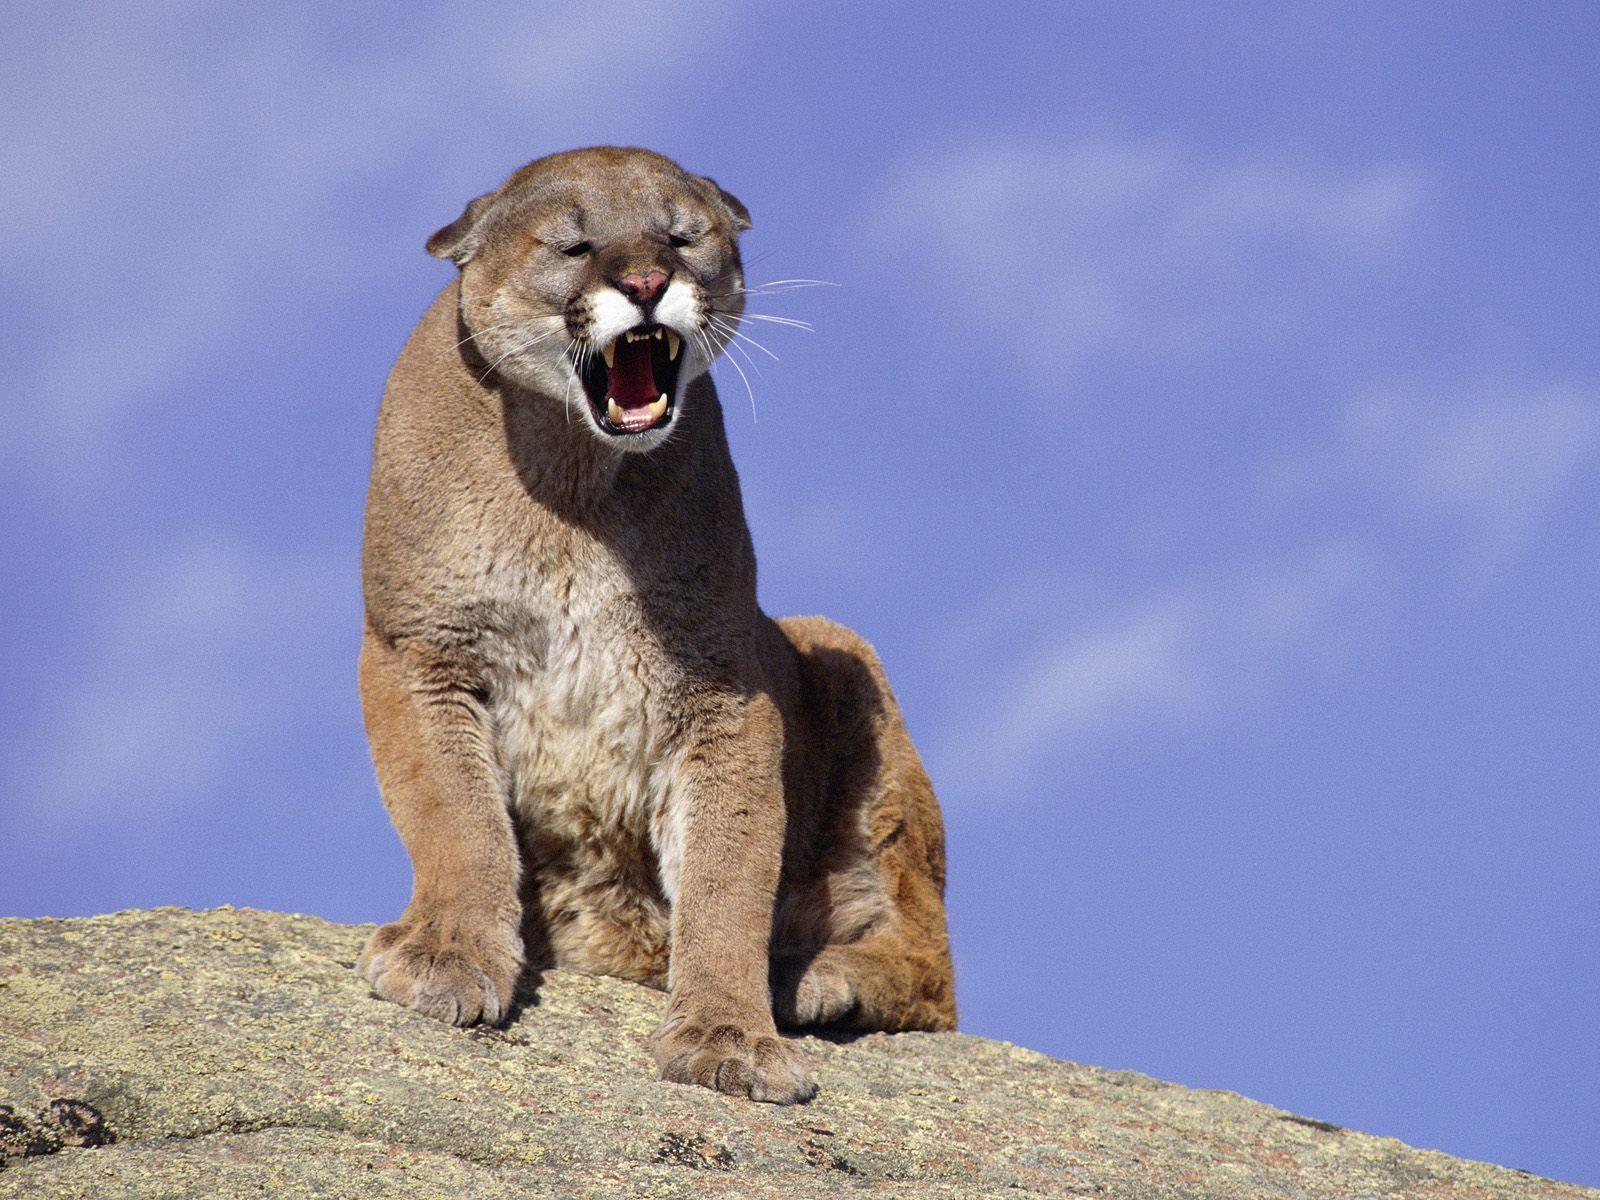 cougar photos - hd desktop wallpapers | 4k hd